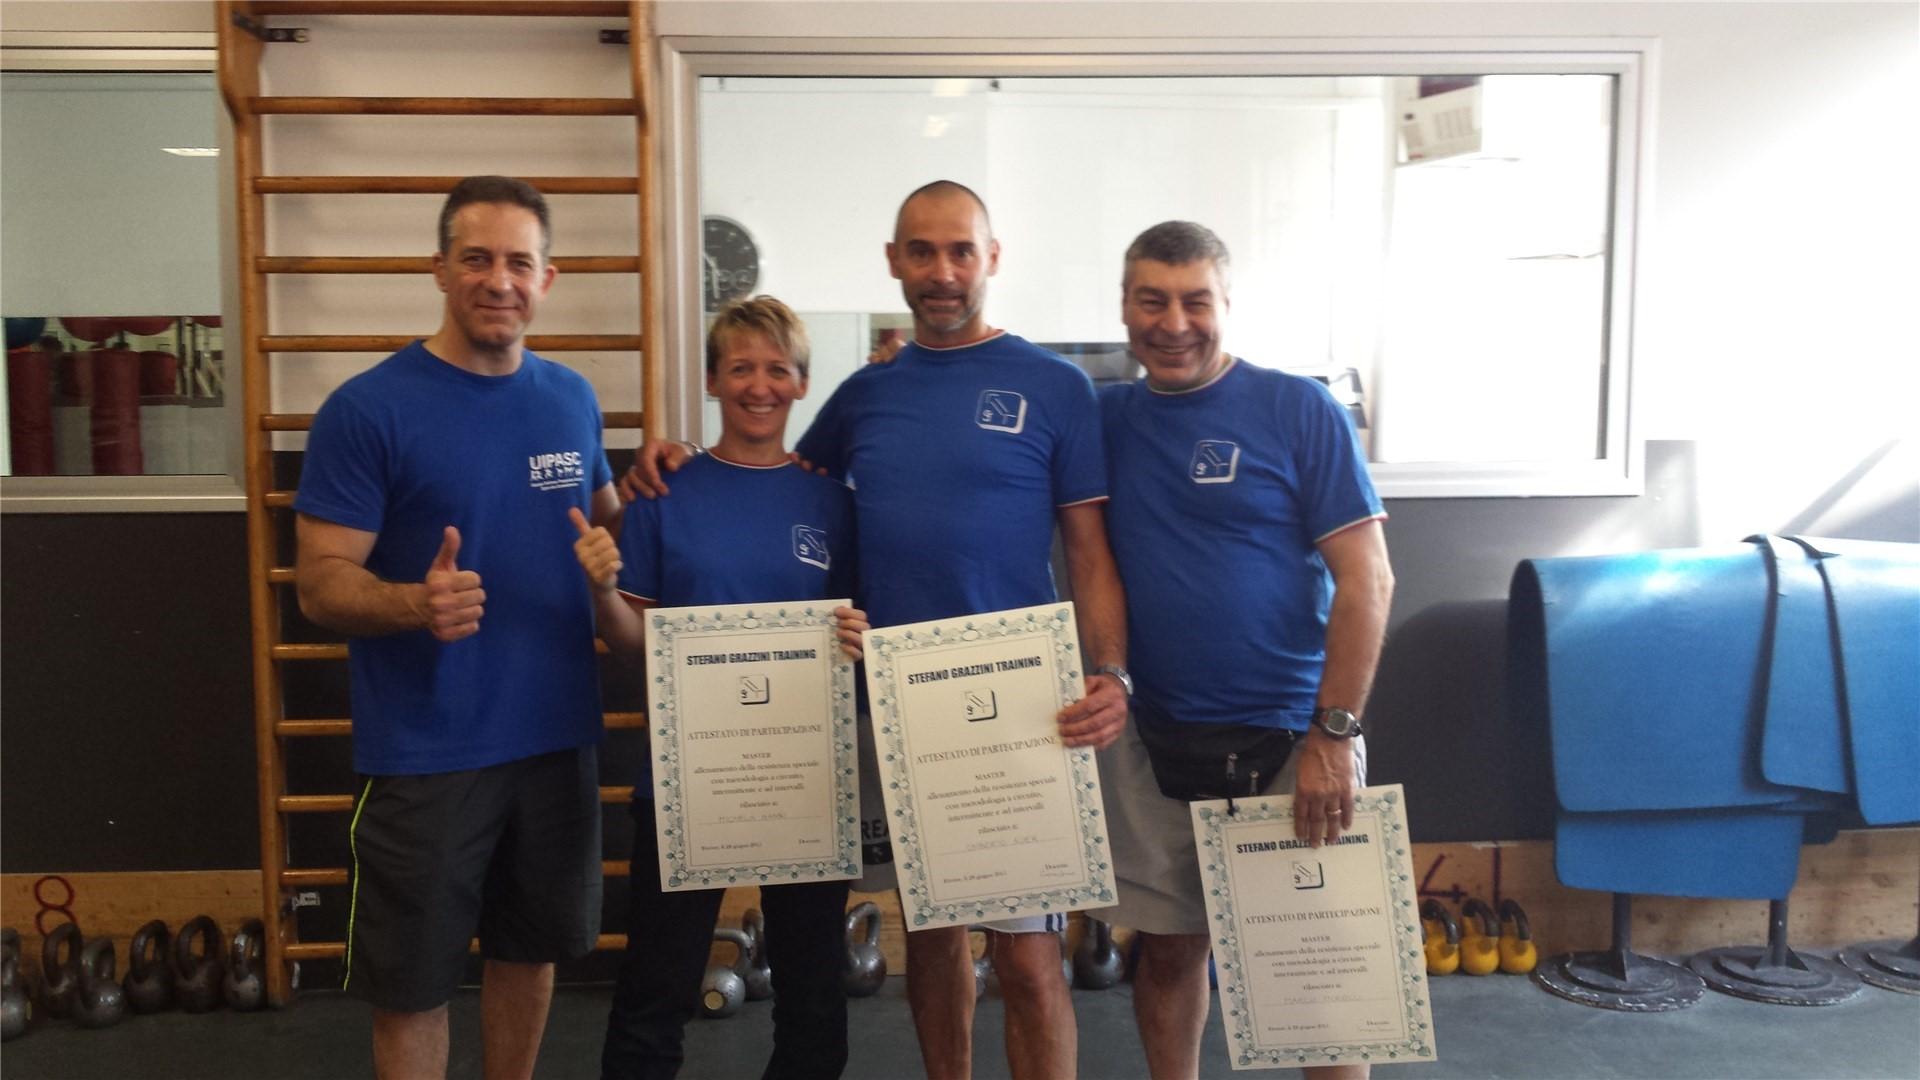 Rassegna Stampa Asd Karate Club Bolzano